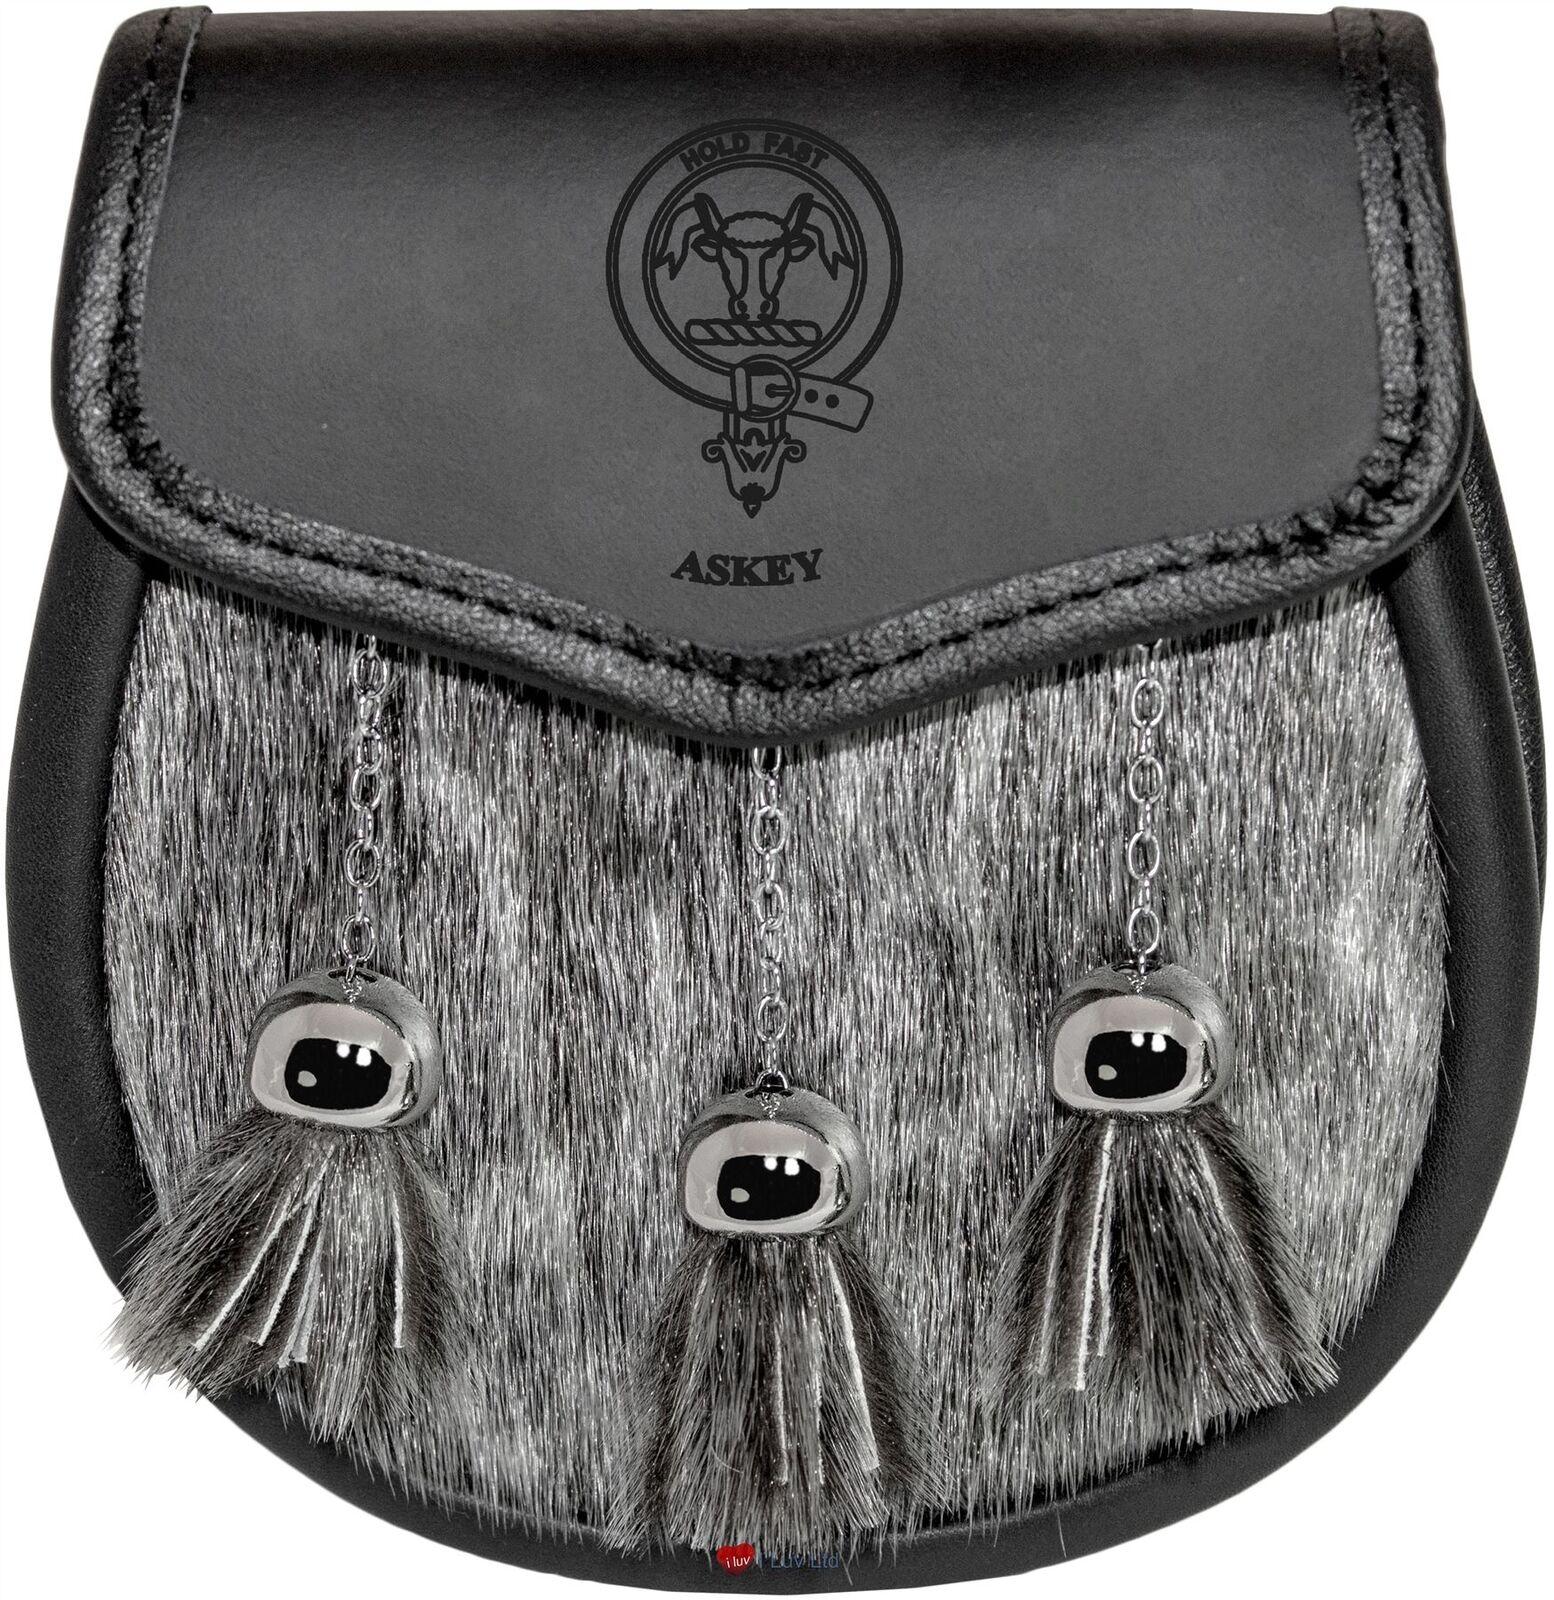 Askey Semi Dress Sporran Fur Plain Leather Flap Scottish Clan Crest